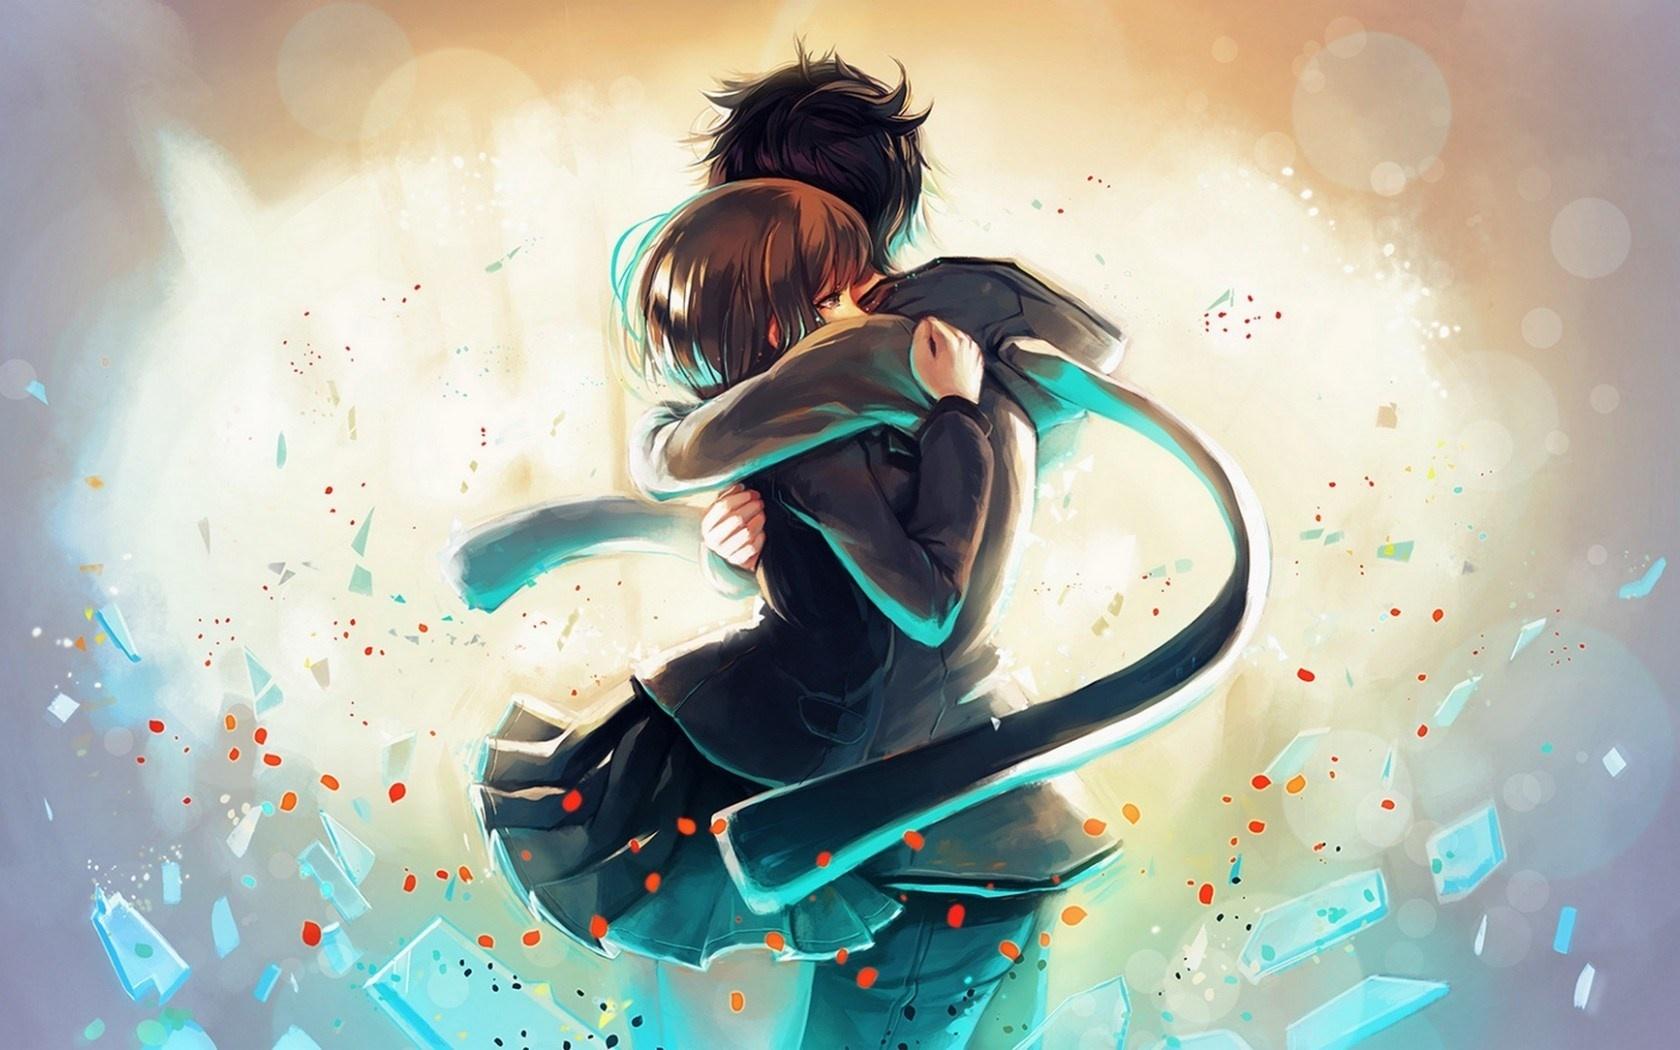 Anime Girl Boy Hug Love Wallpaper 1680x1050